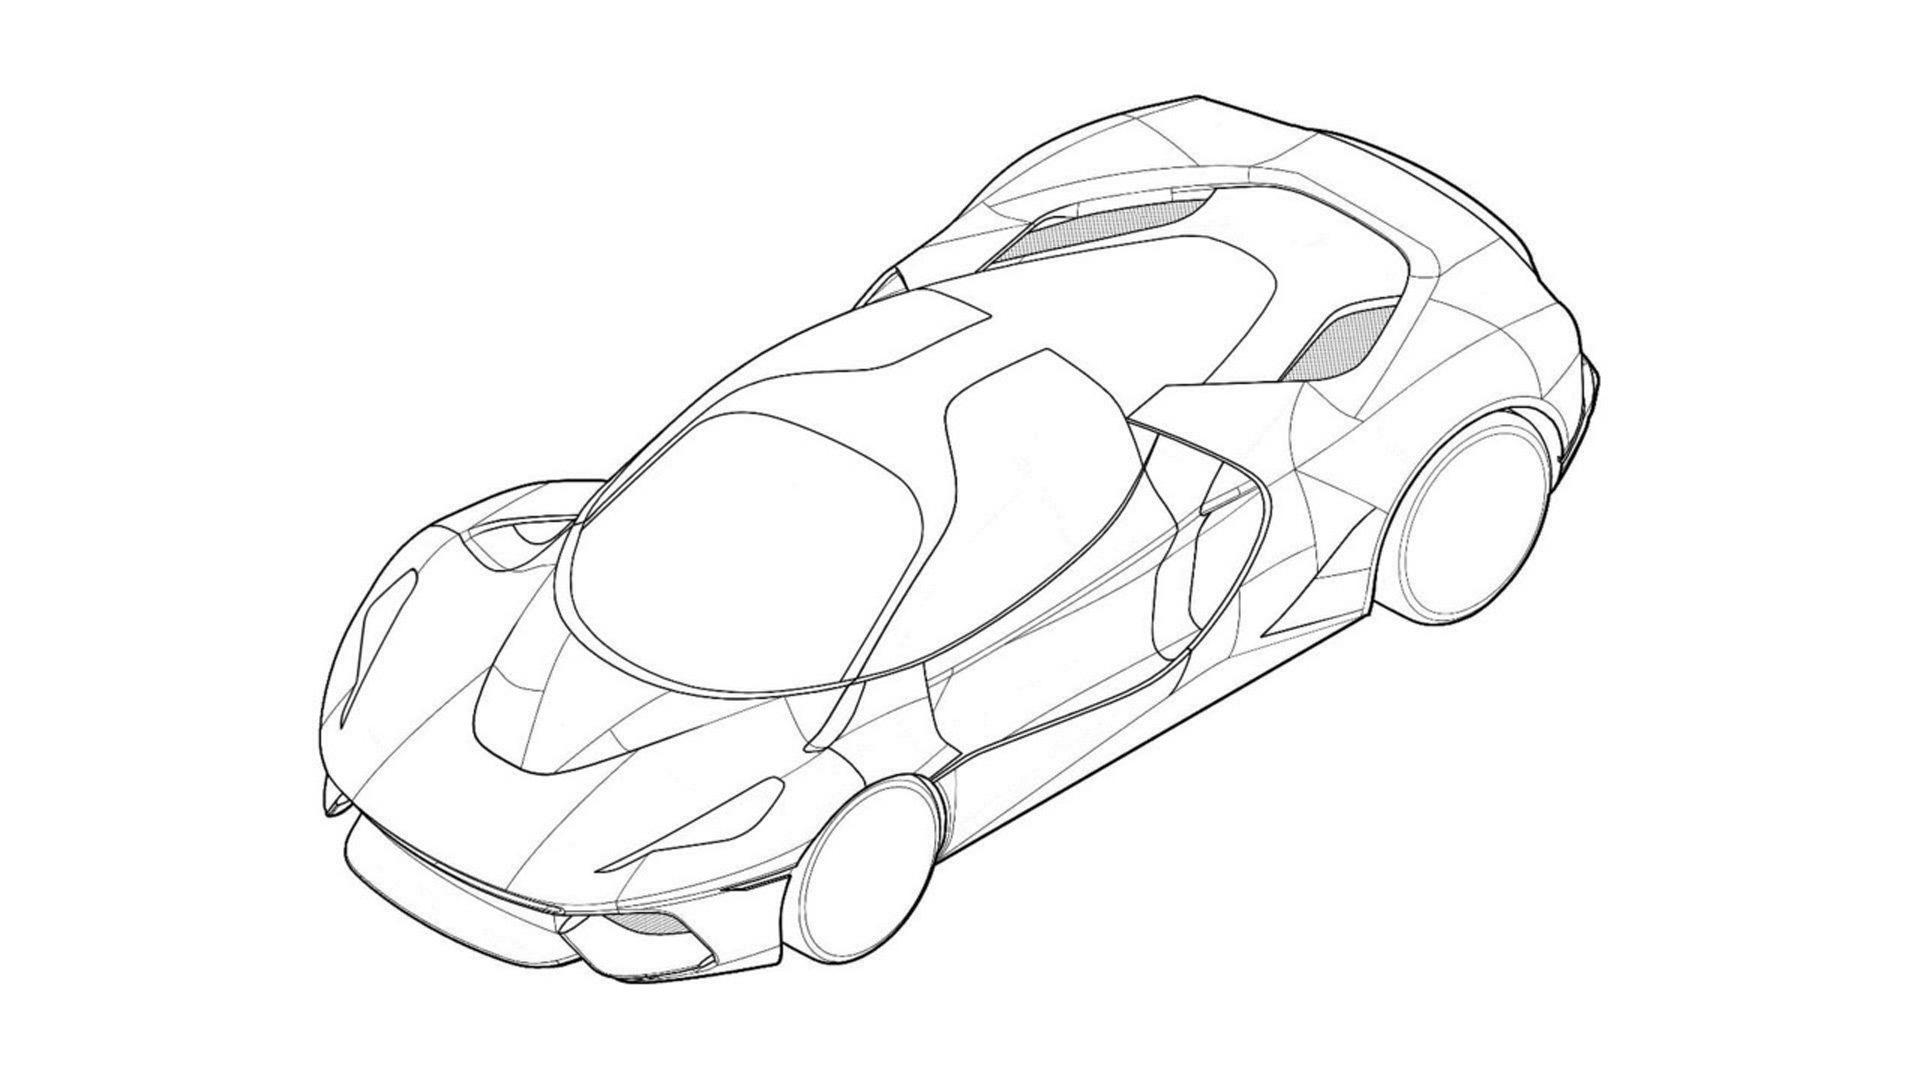 Ferrari files patent drawings for LaFerrari-like hypercar